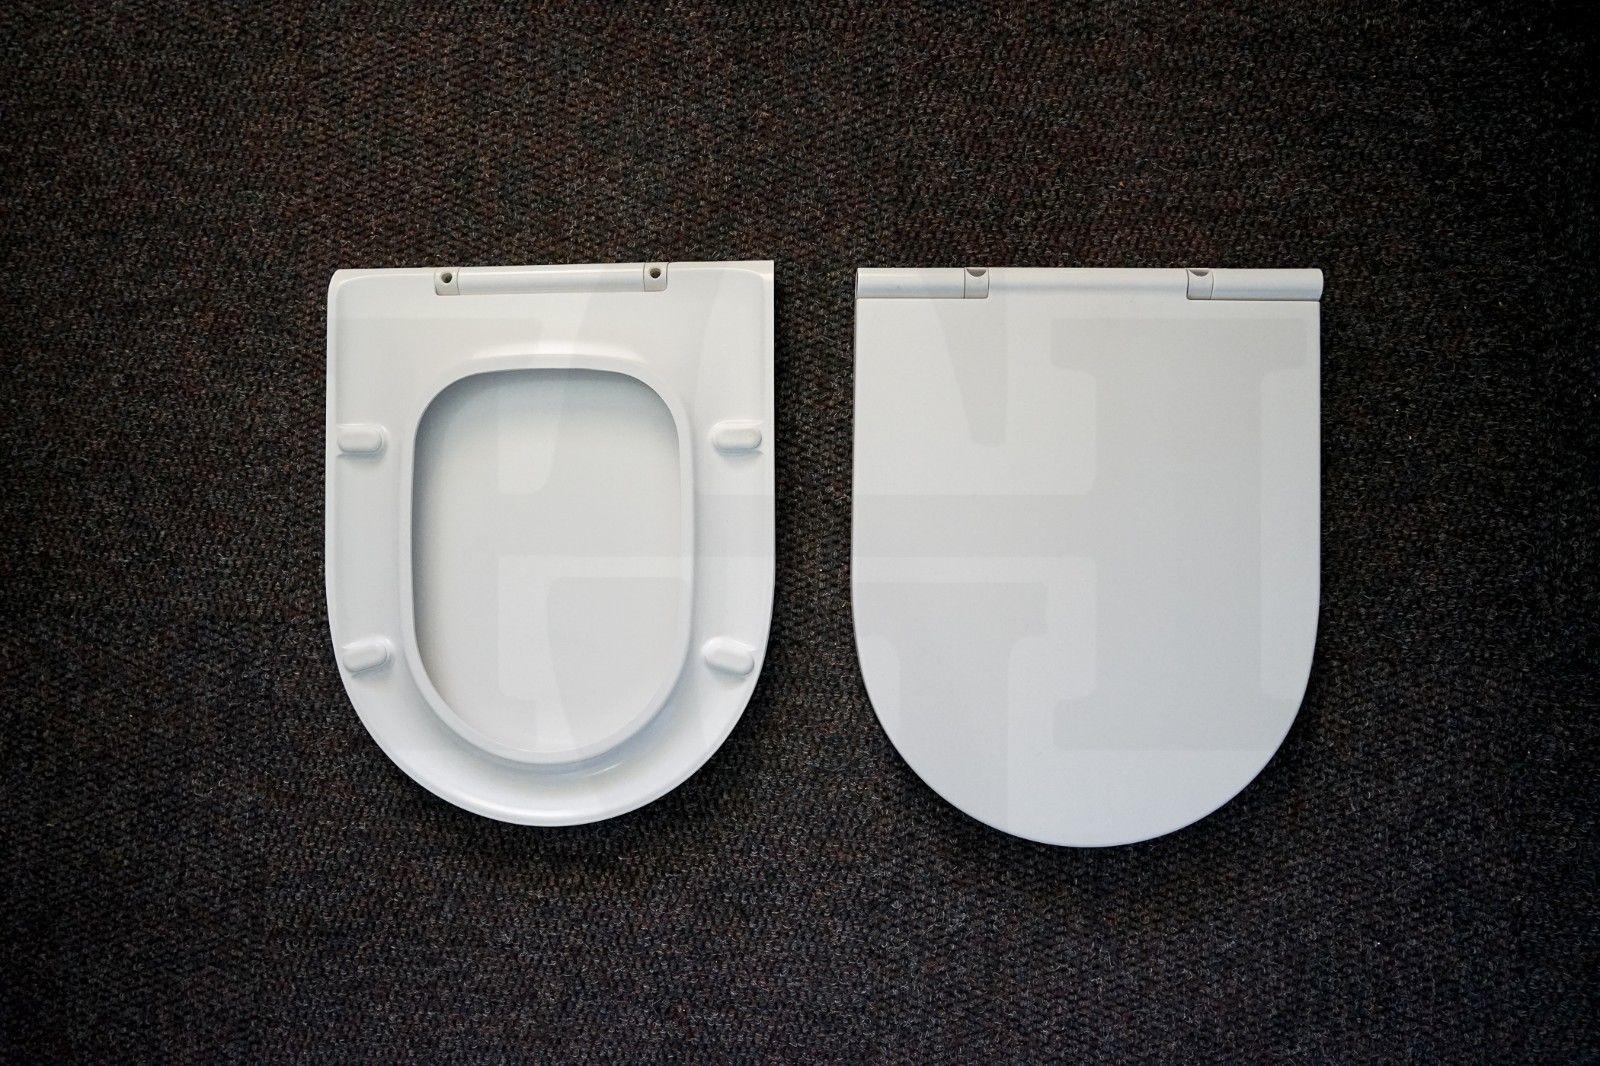 grey soft close toilet seat. Round D Shape Duraplast Top Fixing Soft Close Slimline Quick  soft close grey toilet seat fruitesborras com 100 Grey Toilet Seat Images The